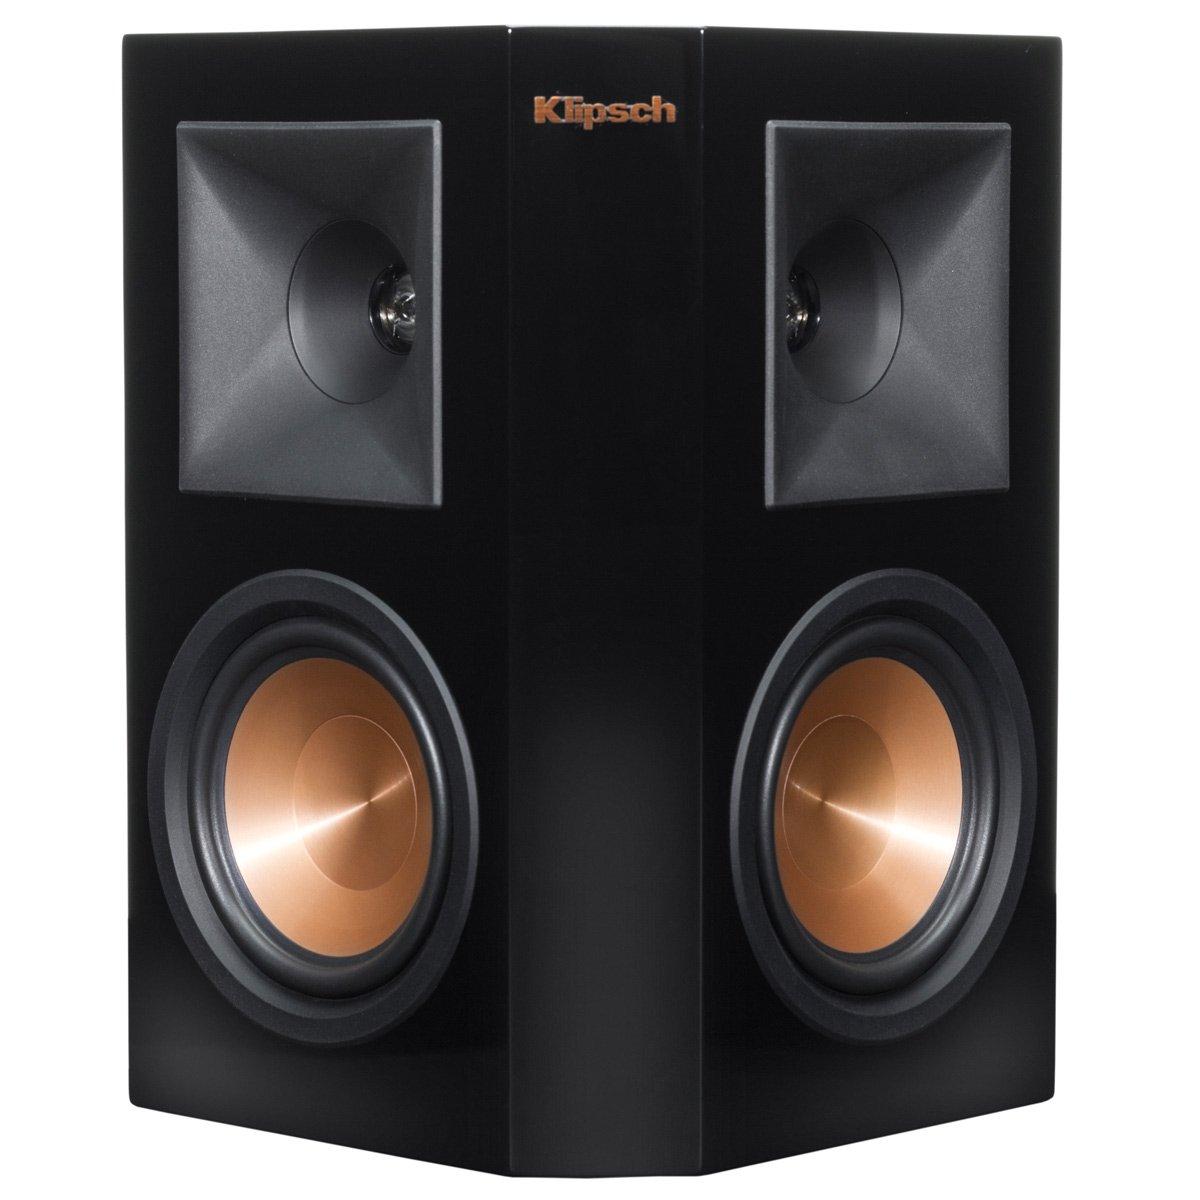 Klipsch RP-250S Reference Premiere Surround Speaker with Dual 5.25'' Cerametallic Cone Woofers - Single Speaker (Piano Black)